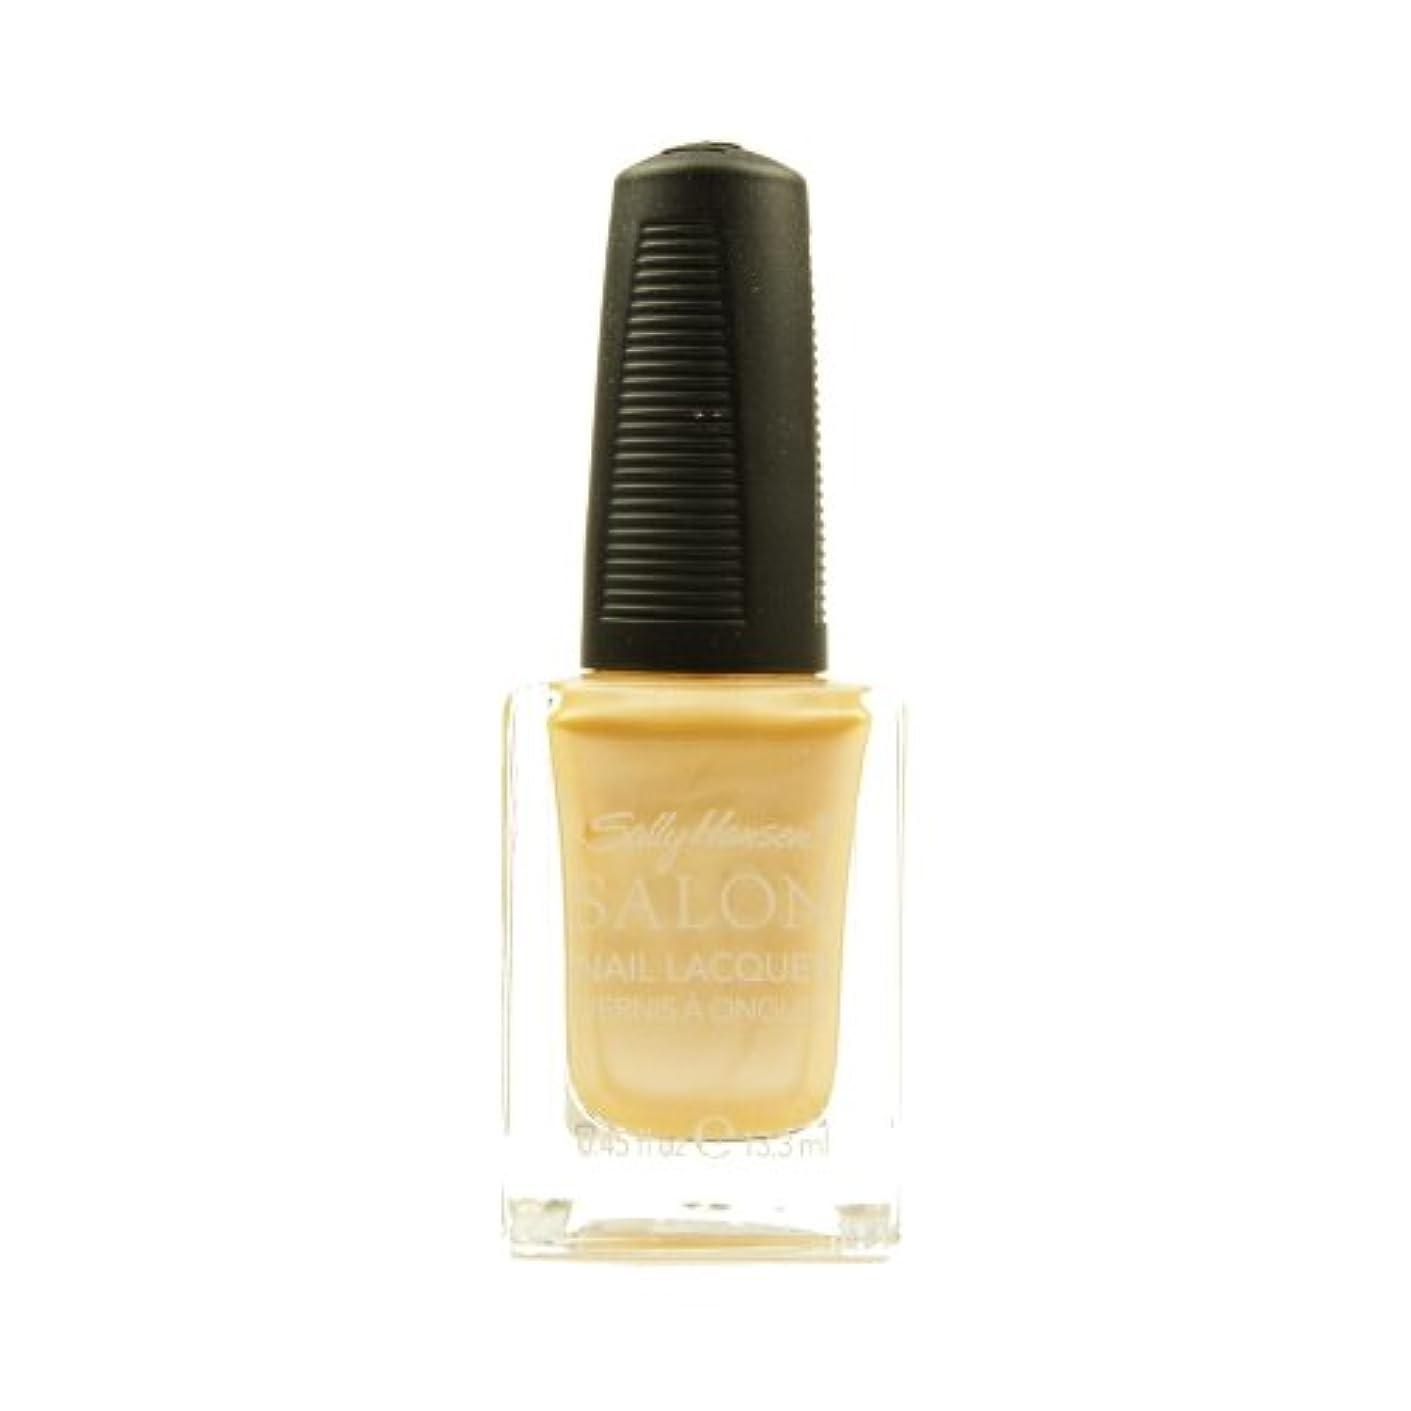 有効な魅力邪魔(3 Pack) SALLY HANSEN Salon Nail Lacquer 4134 - Fizz It Is (並行輸入品)